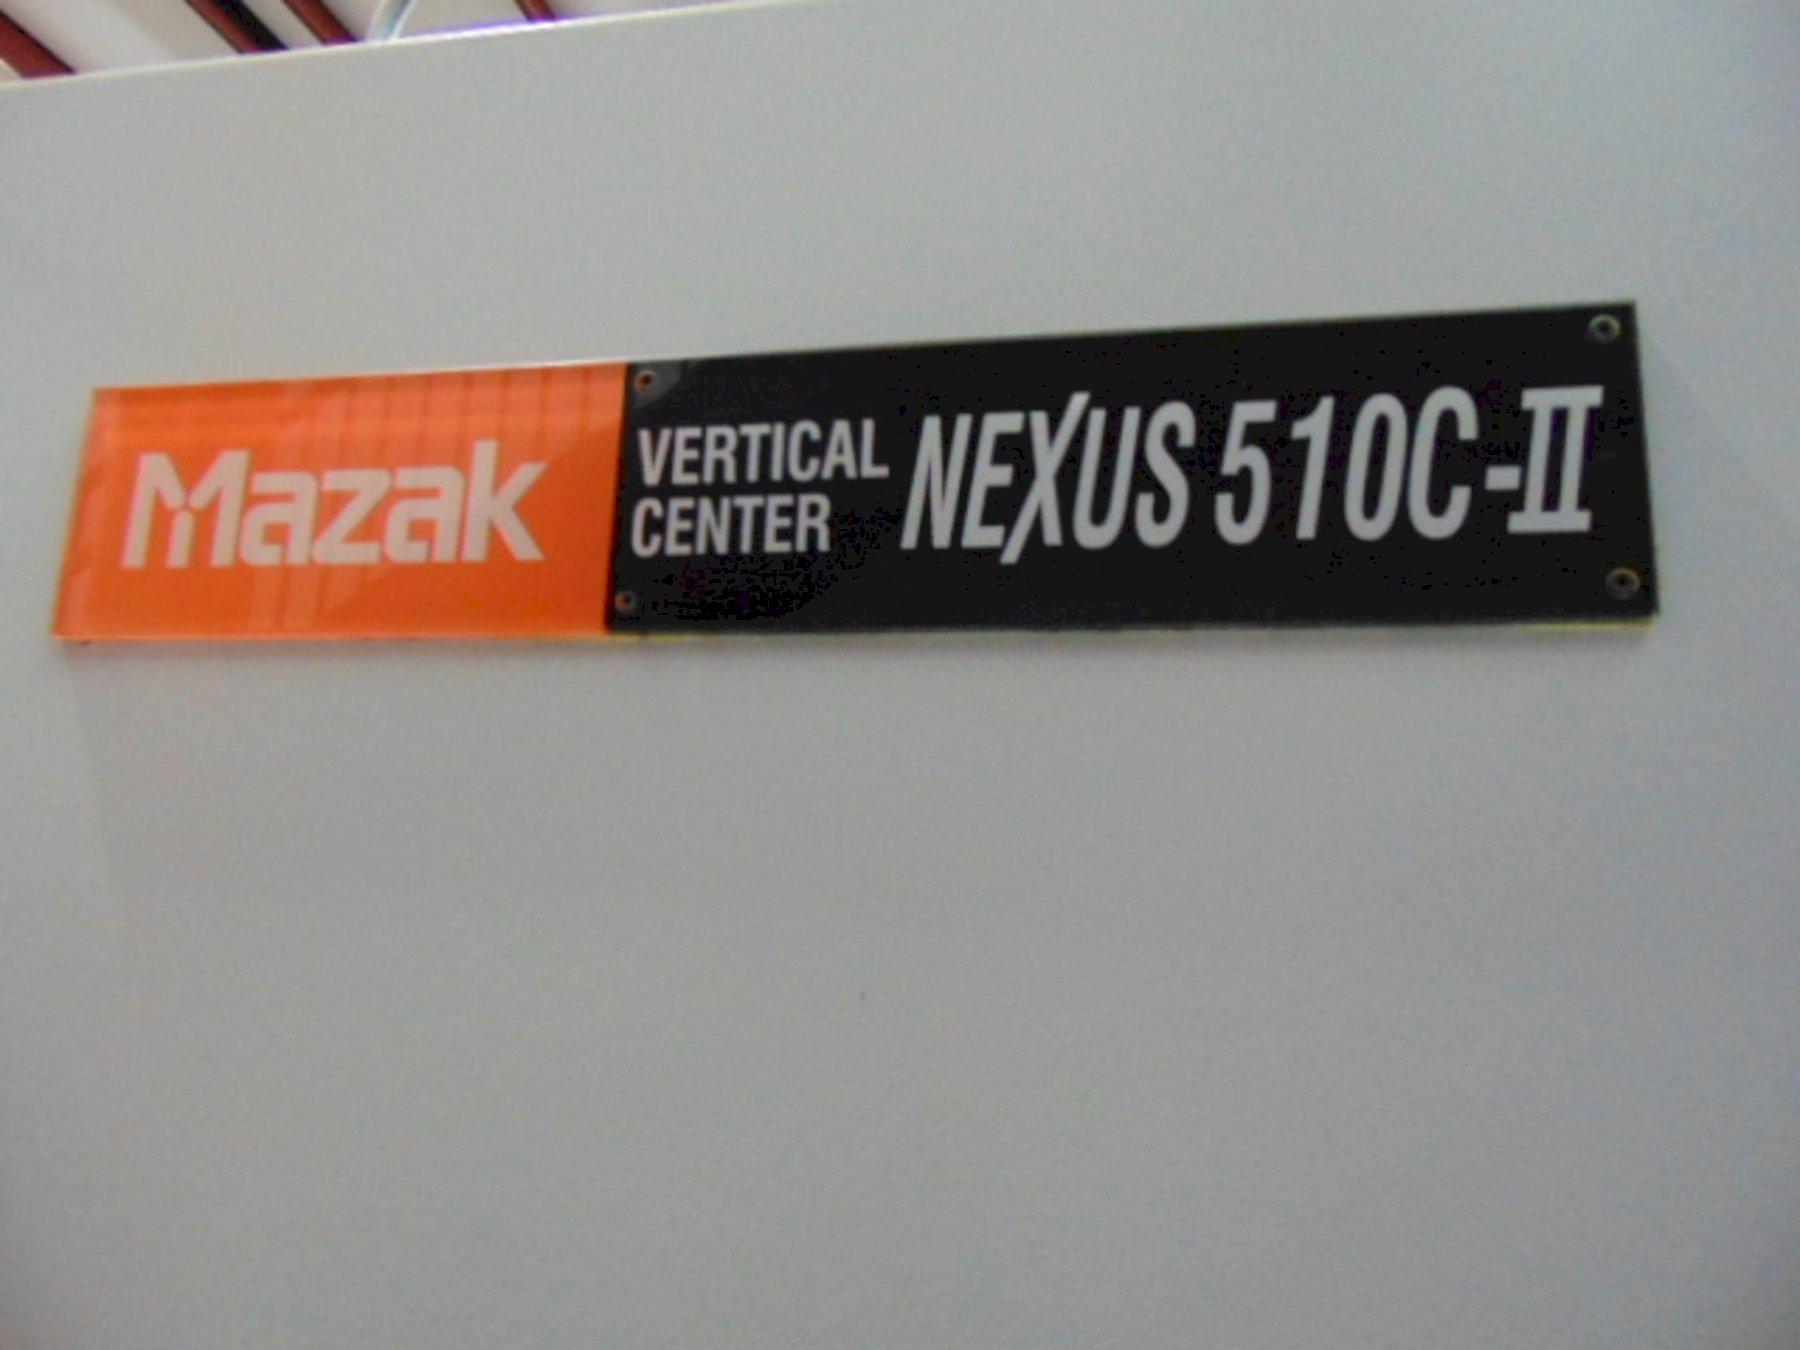 MAZAK NEXUS MDL. 510C-II CENTRO DE MECANIZADO VERTICAL CNC